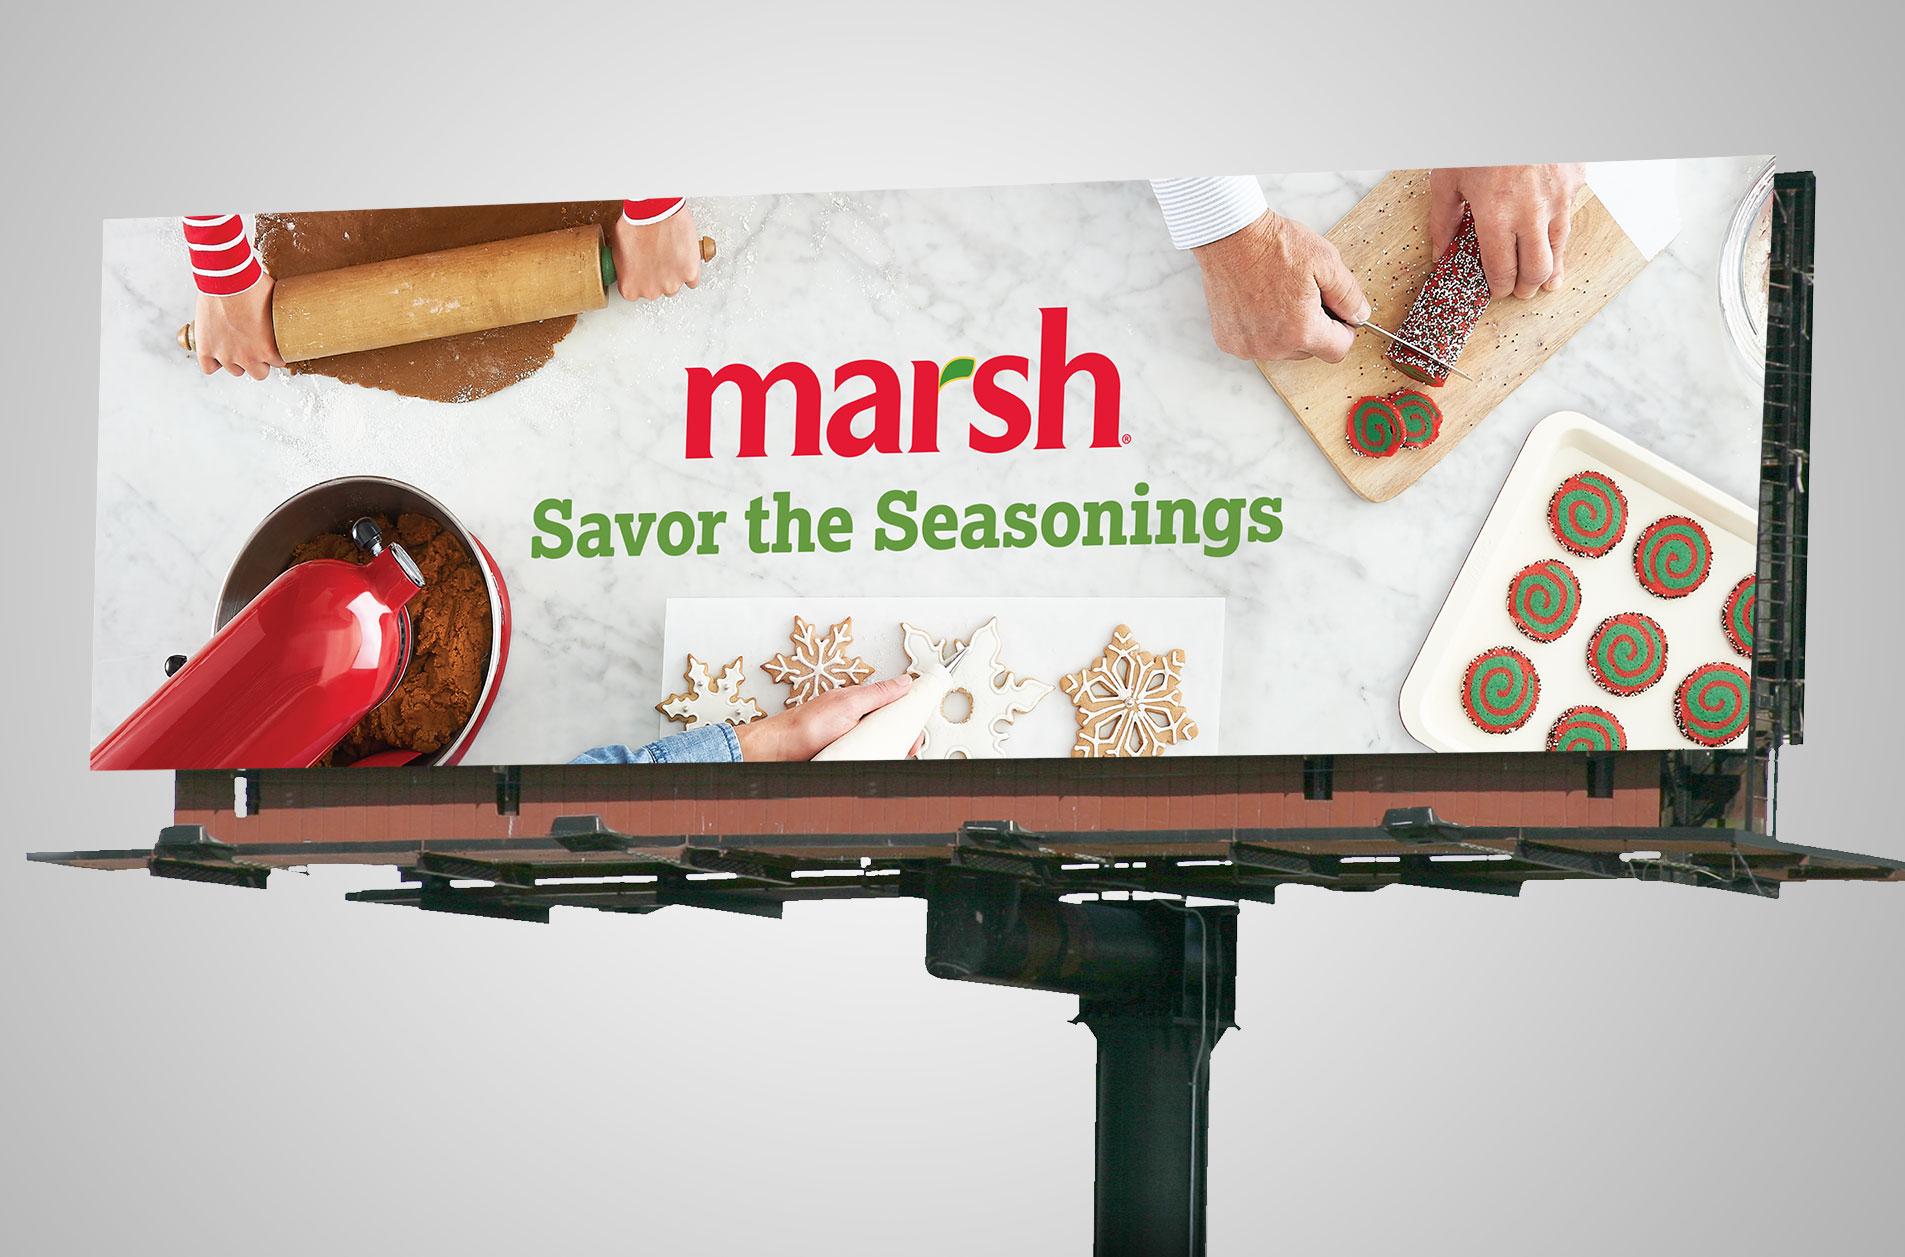 marsh-billboard.jpg